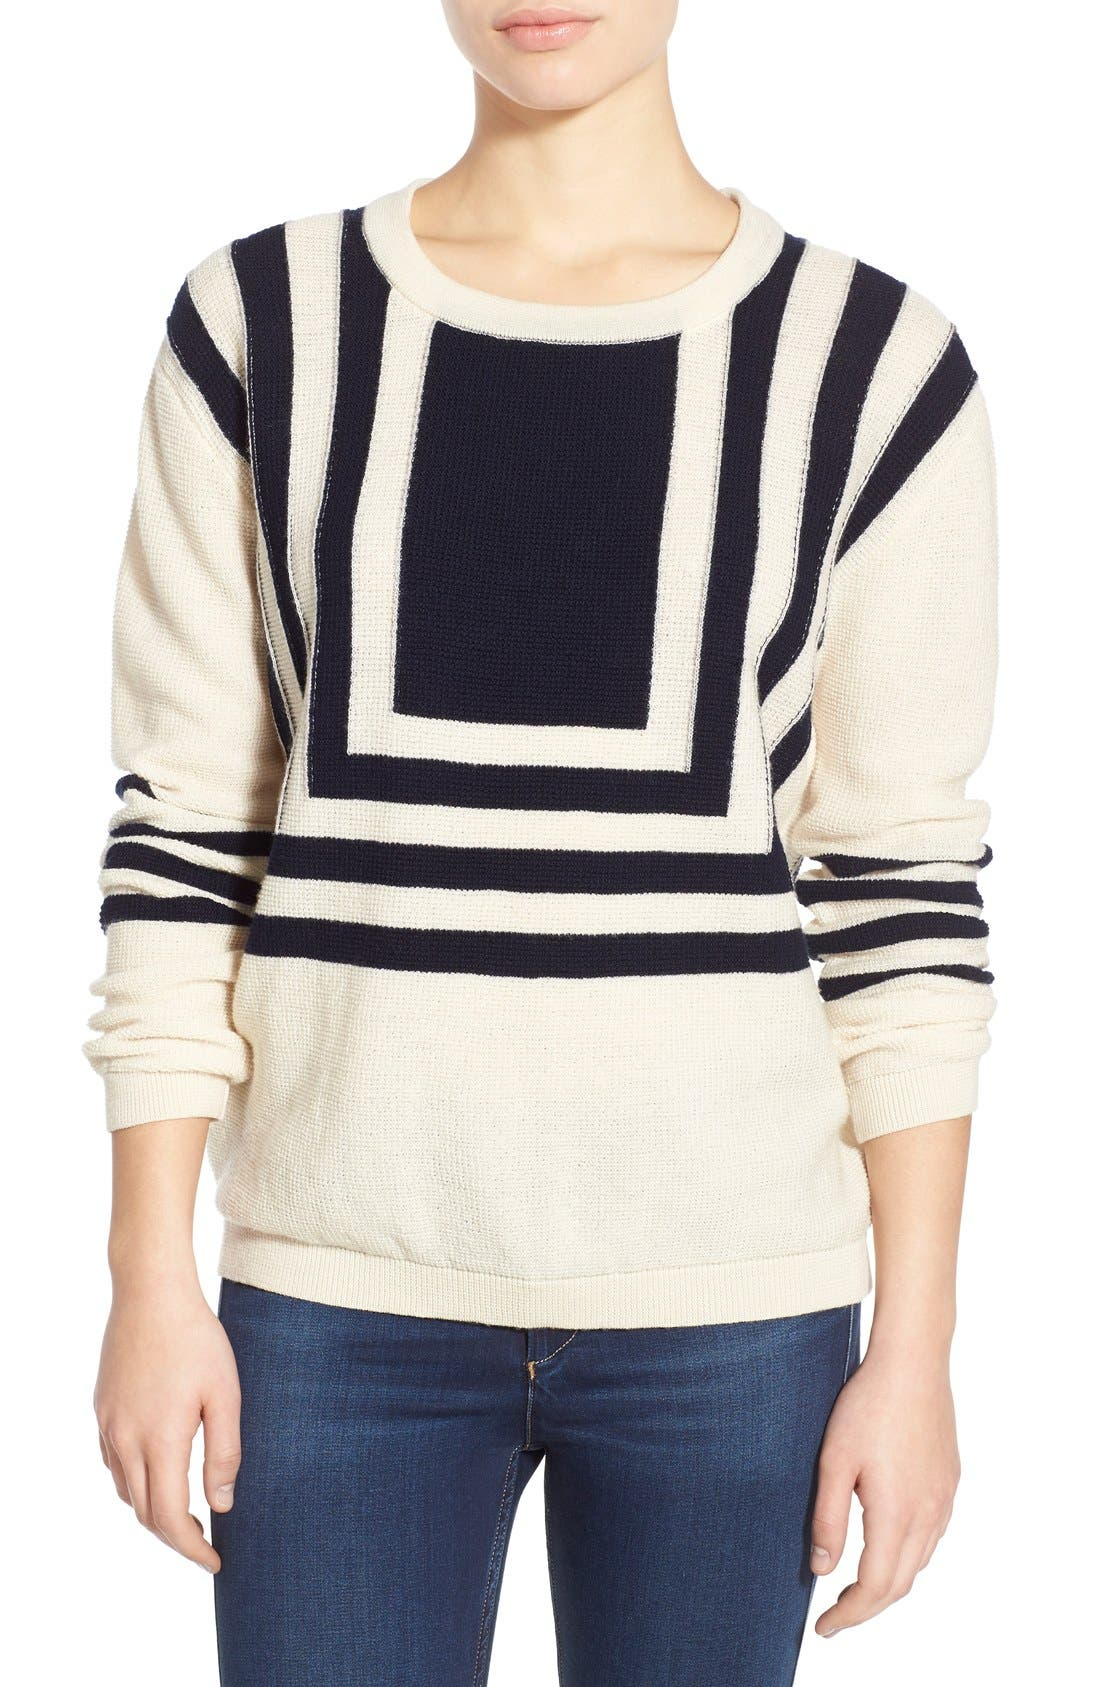 Main Image - M.i.h. Jeans 'Bib Breton' Crewneck Sweater